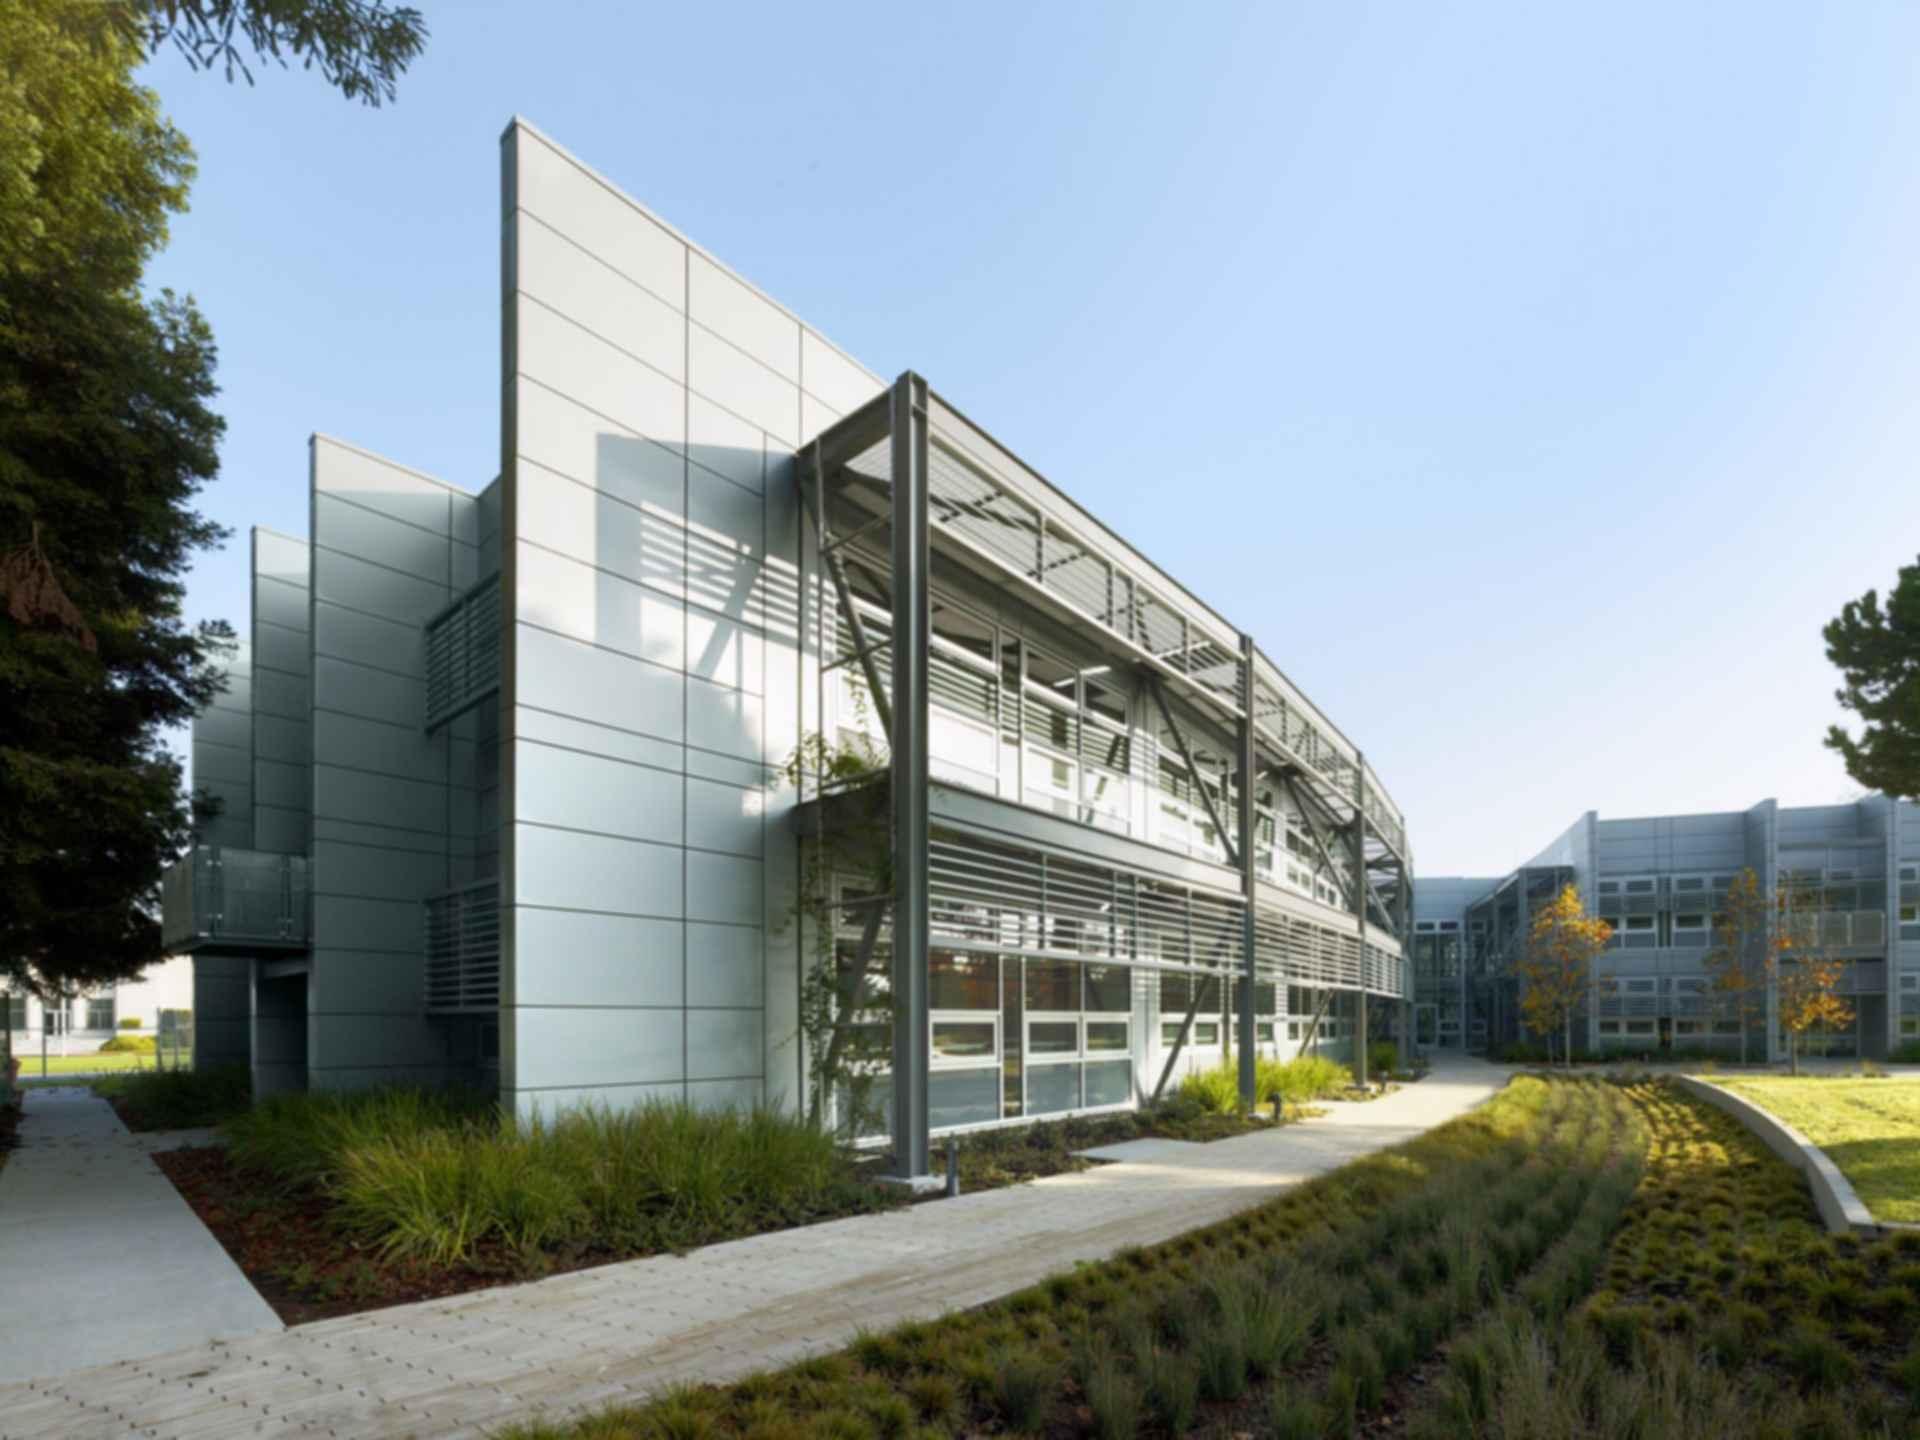 NASA Sustainability Base - Exterior/Walkway